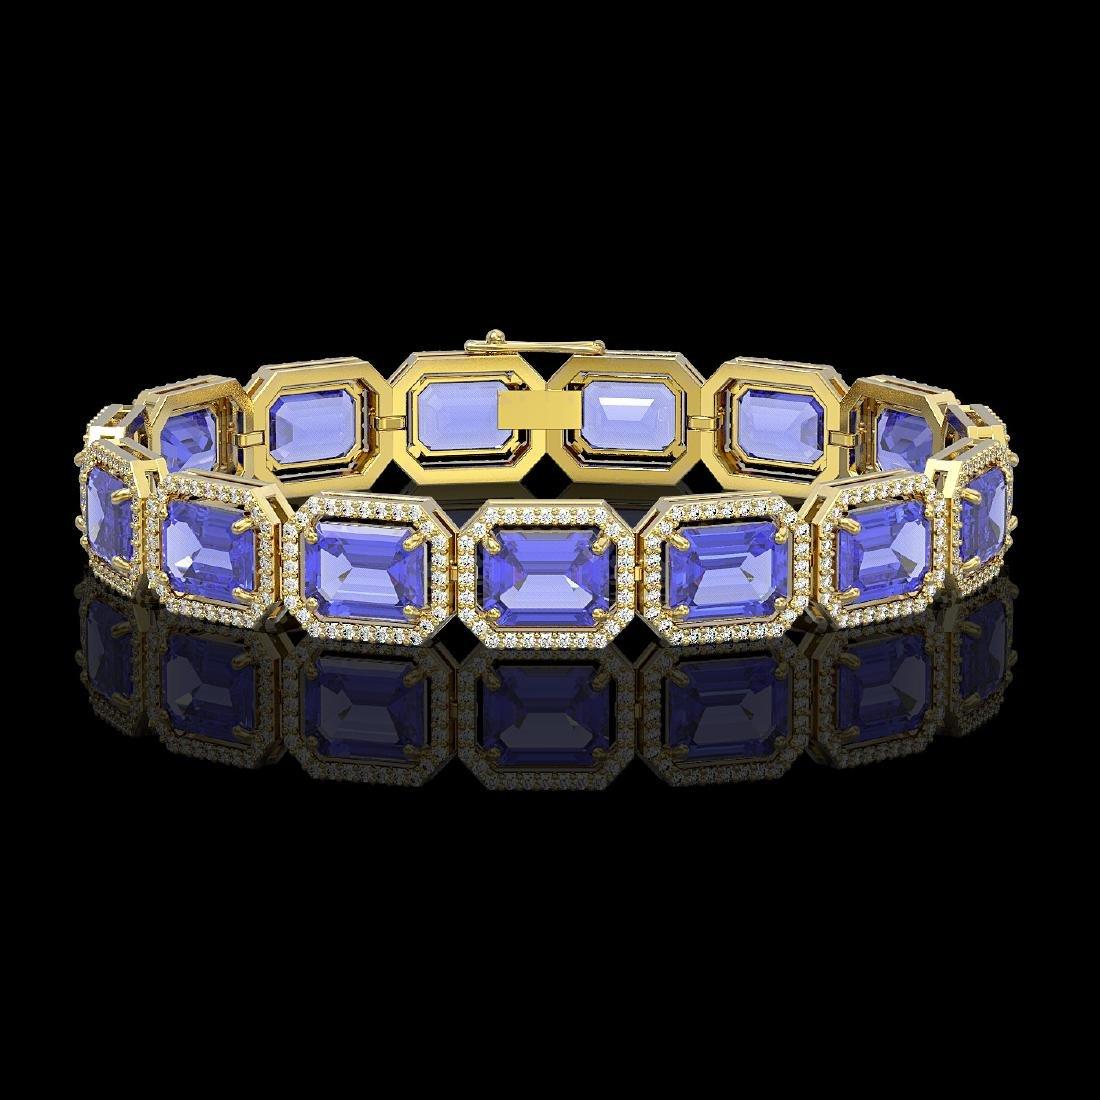 36.37 CTW Tanzanite & Diamond Halo Bracelet 10K Yellow